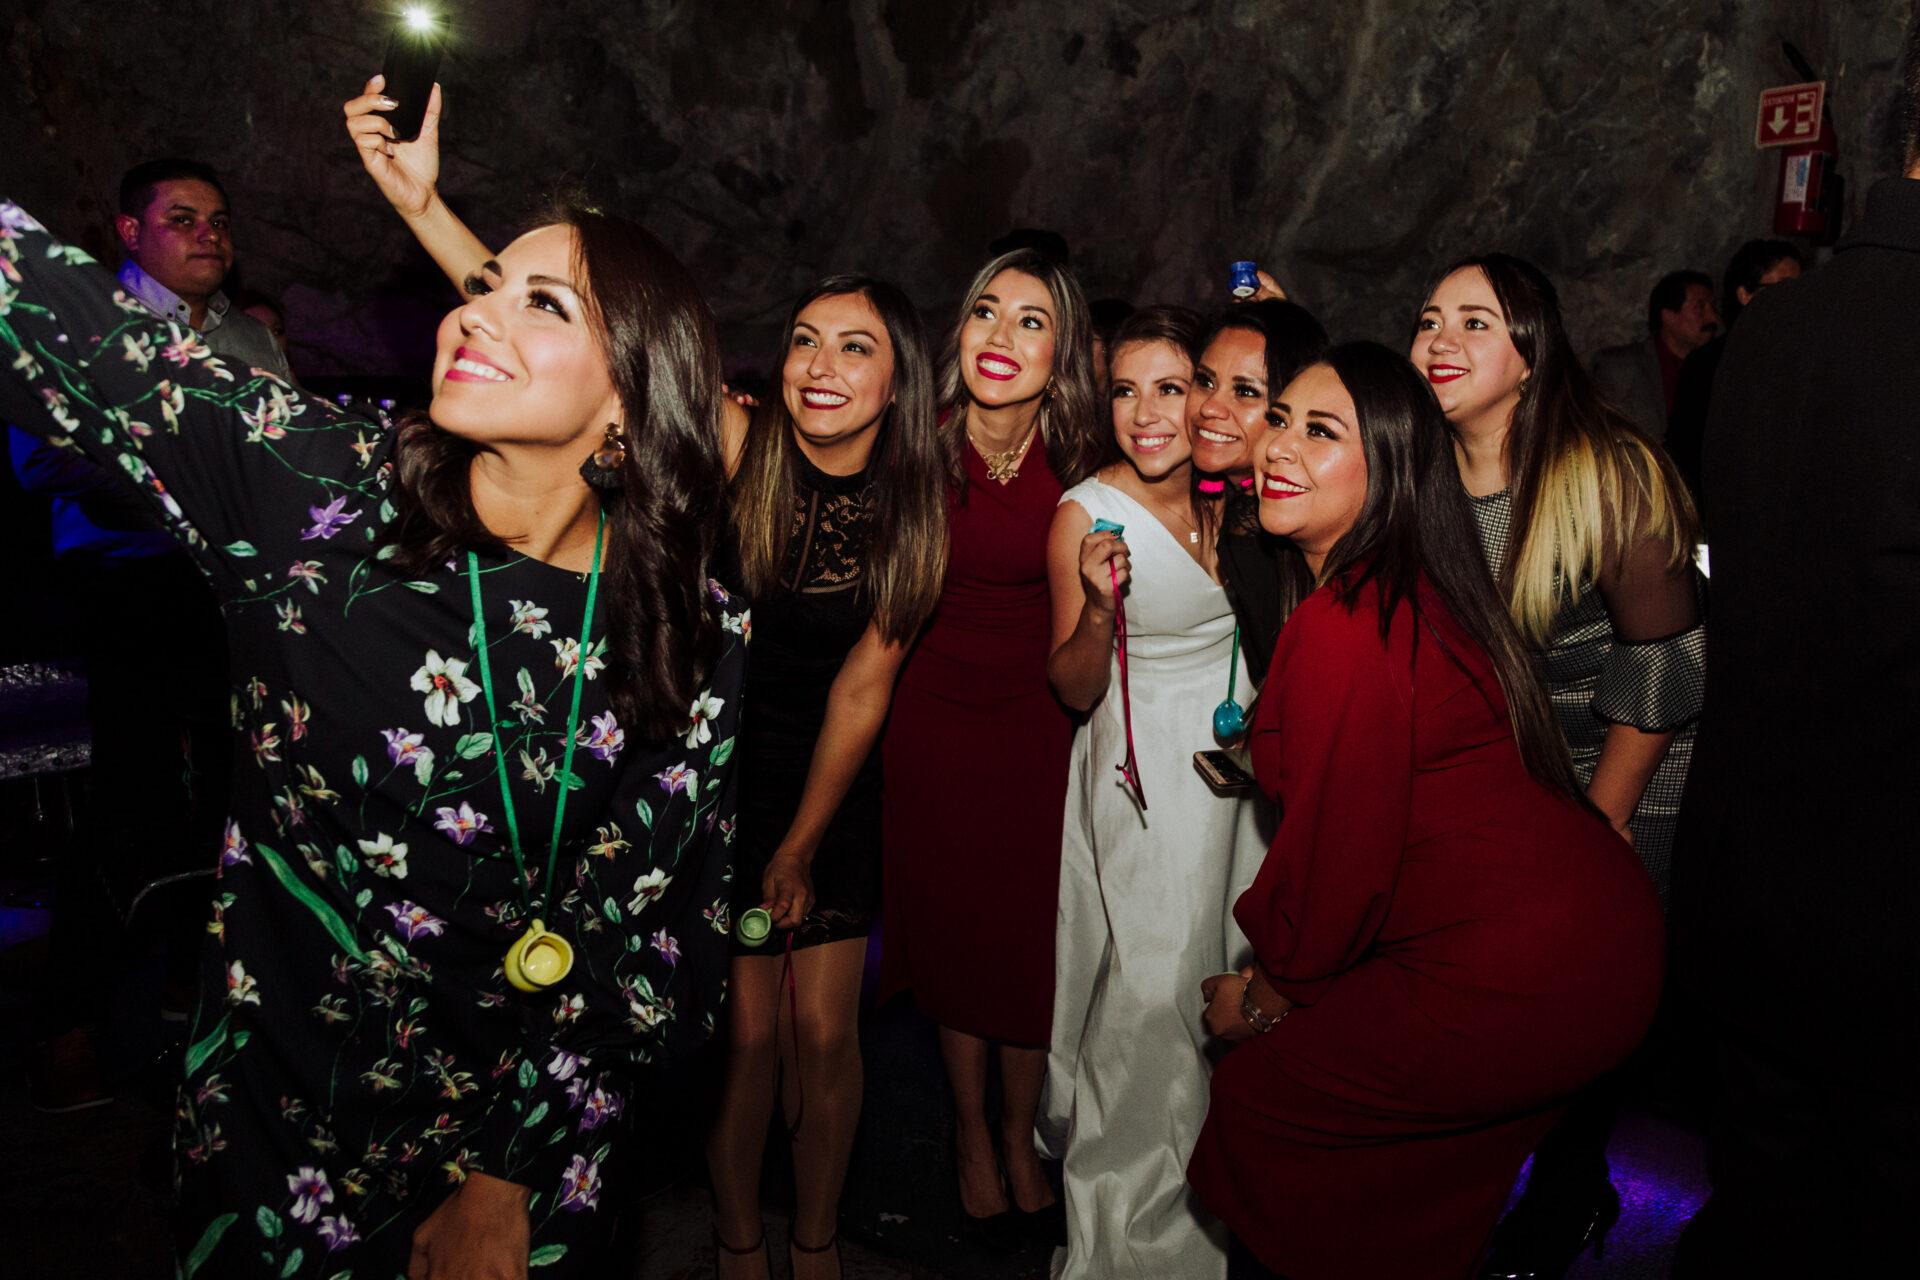 javier_noriega_fotografo_bodas_la_mina_club_zacatecas_wedding_photographer24